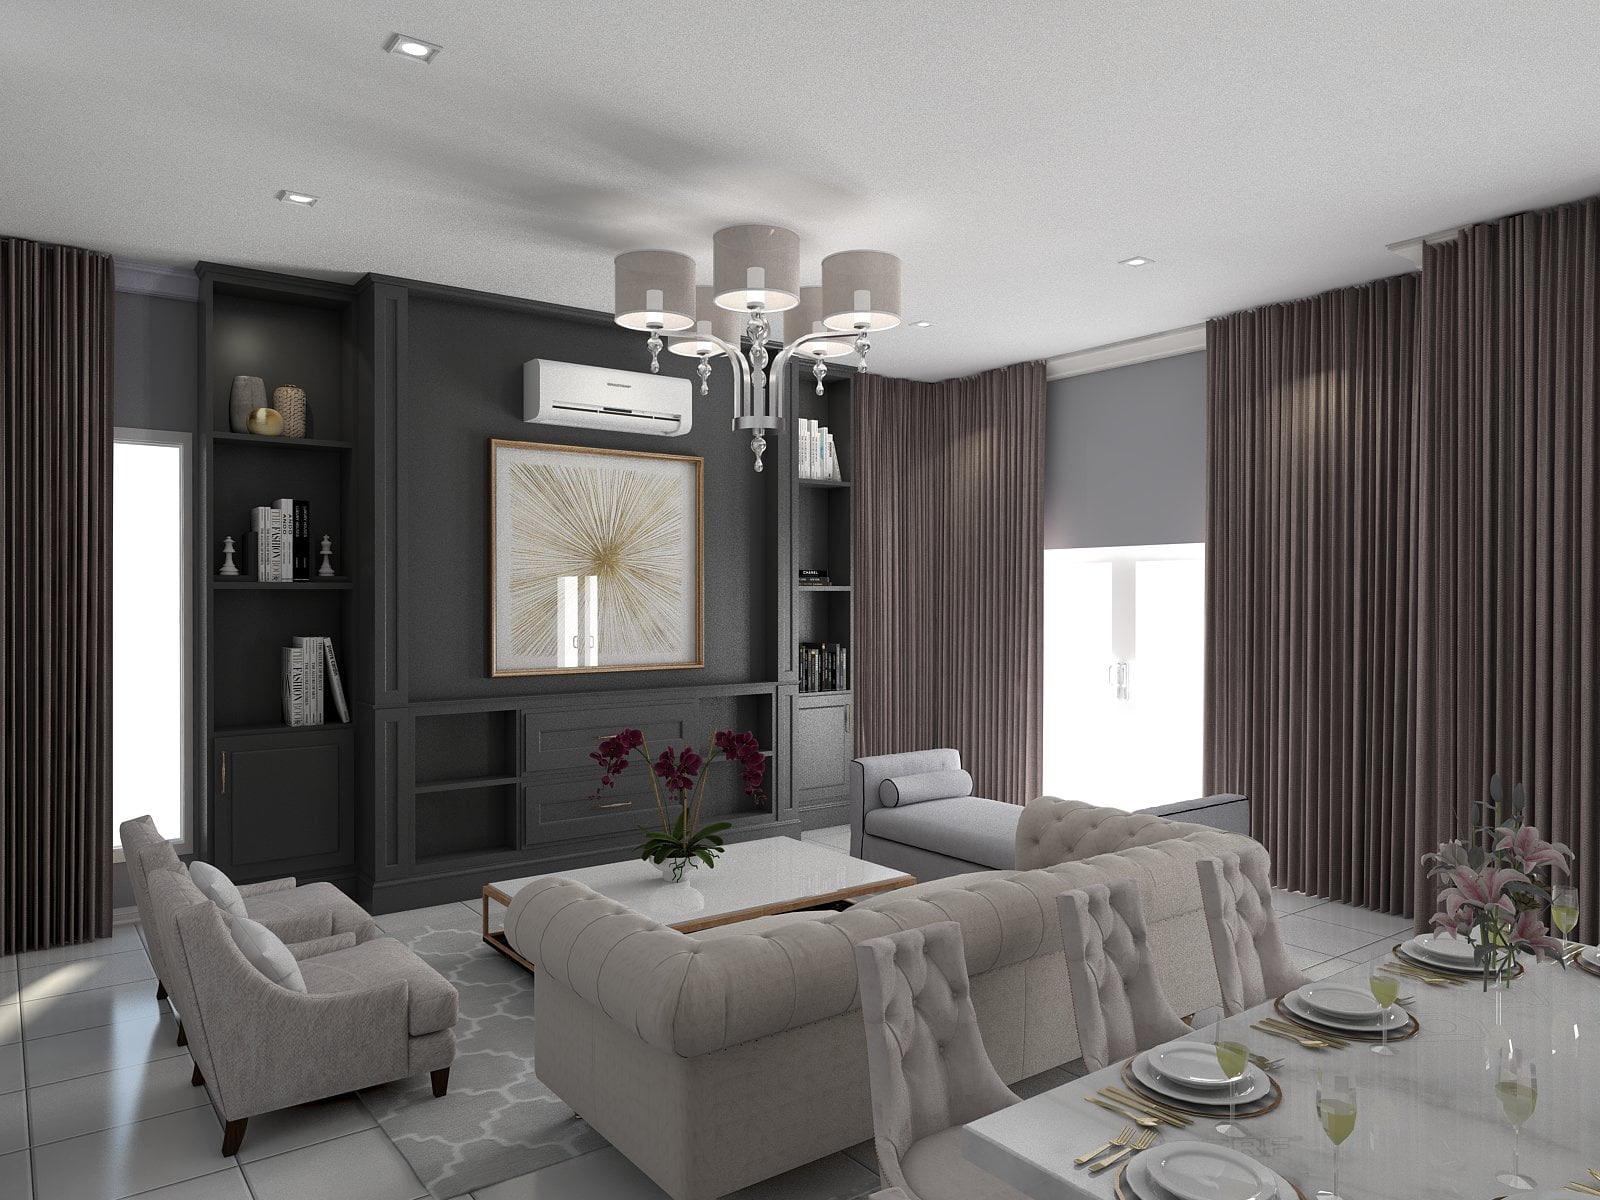 Home Furnishing Stores Kuala Lumpur Malaysia | Laurea 1